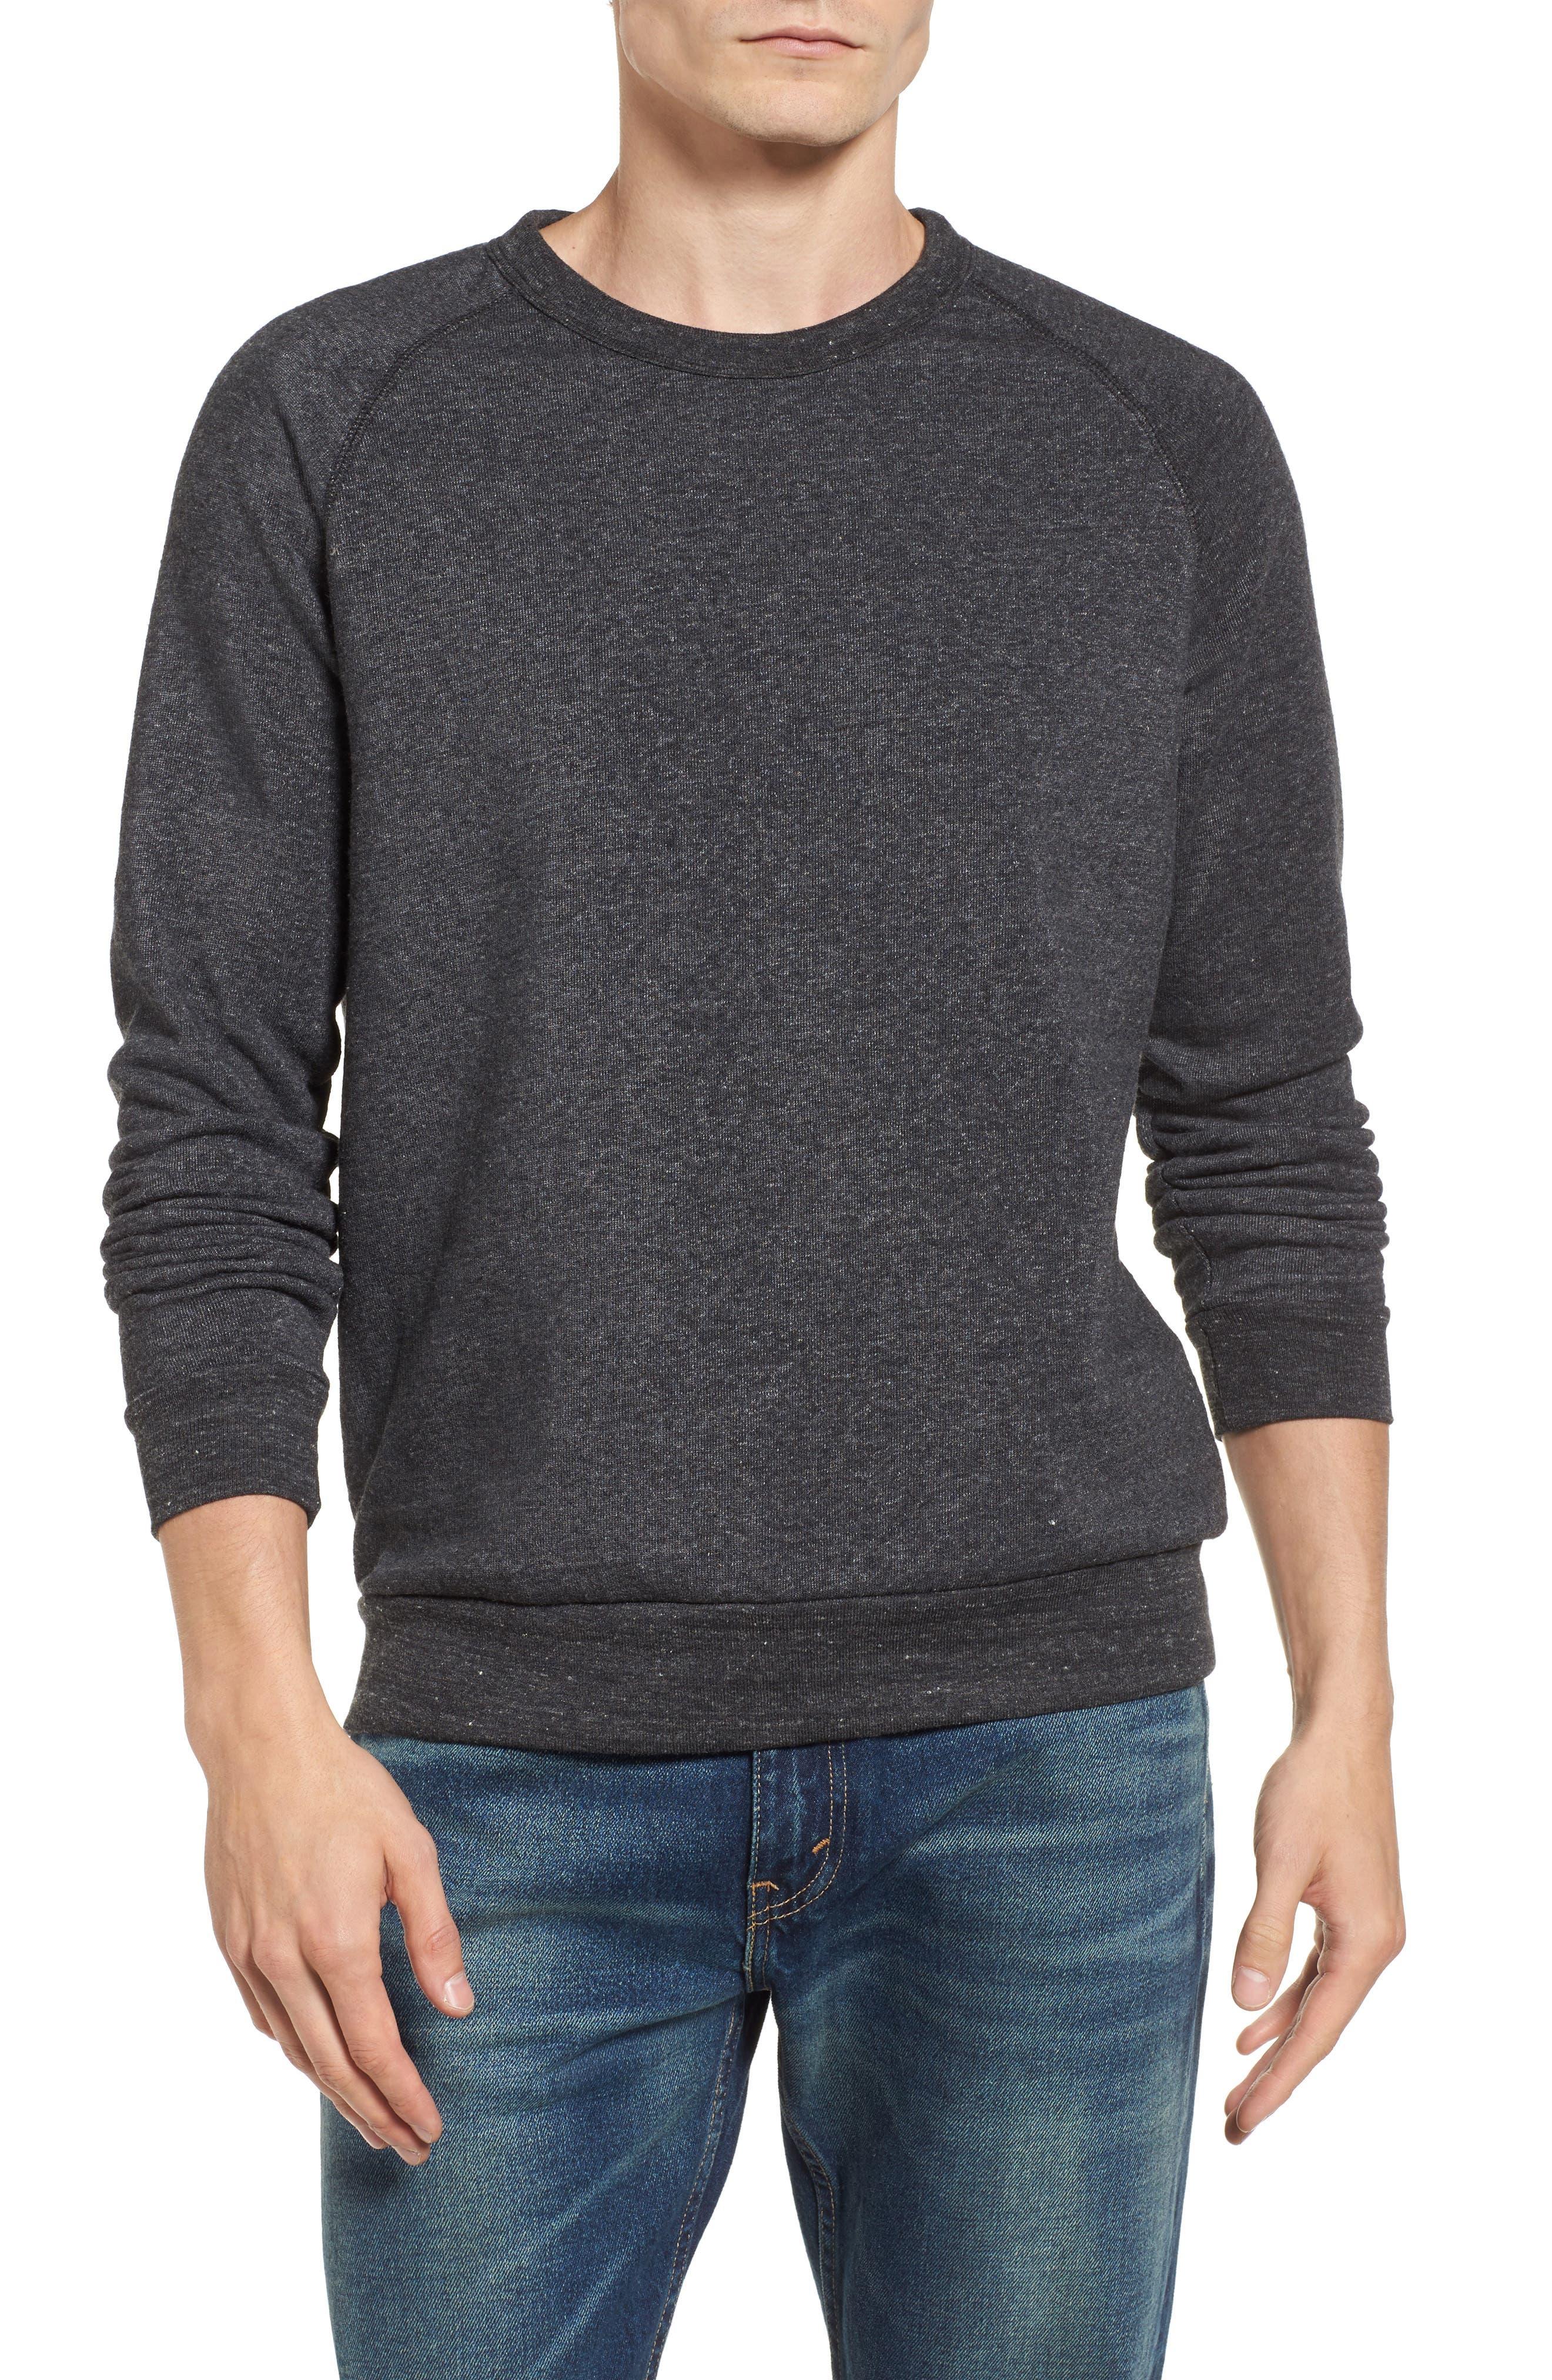 'The Champ' Sweatshirt,                         Main,                         color, Eco Black